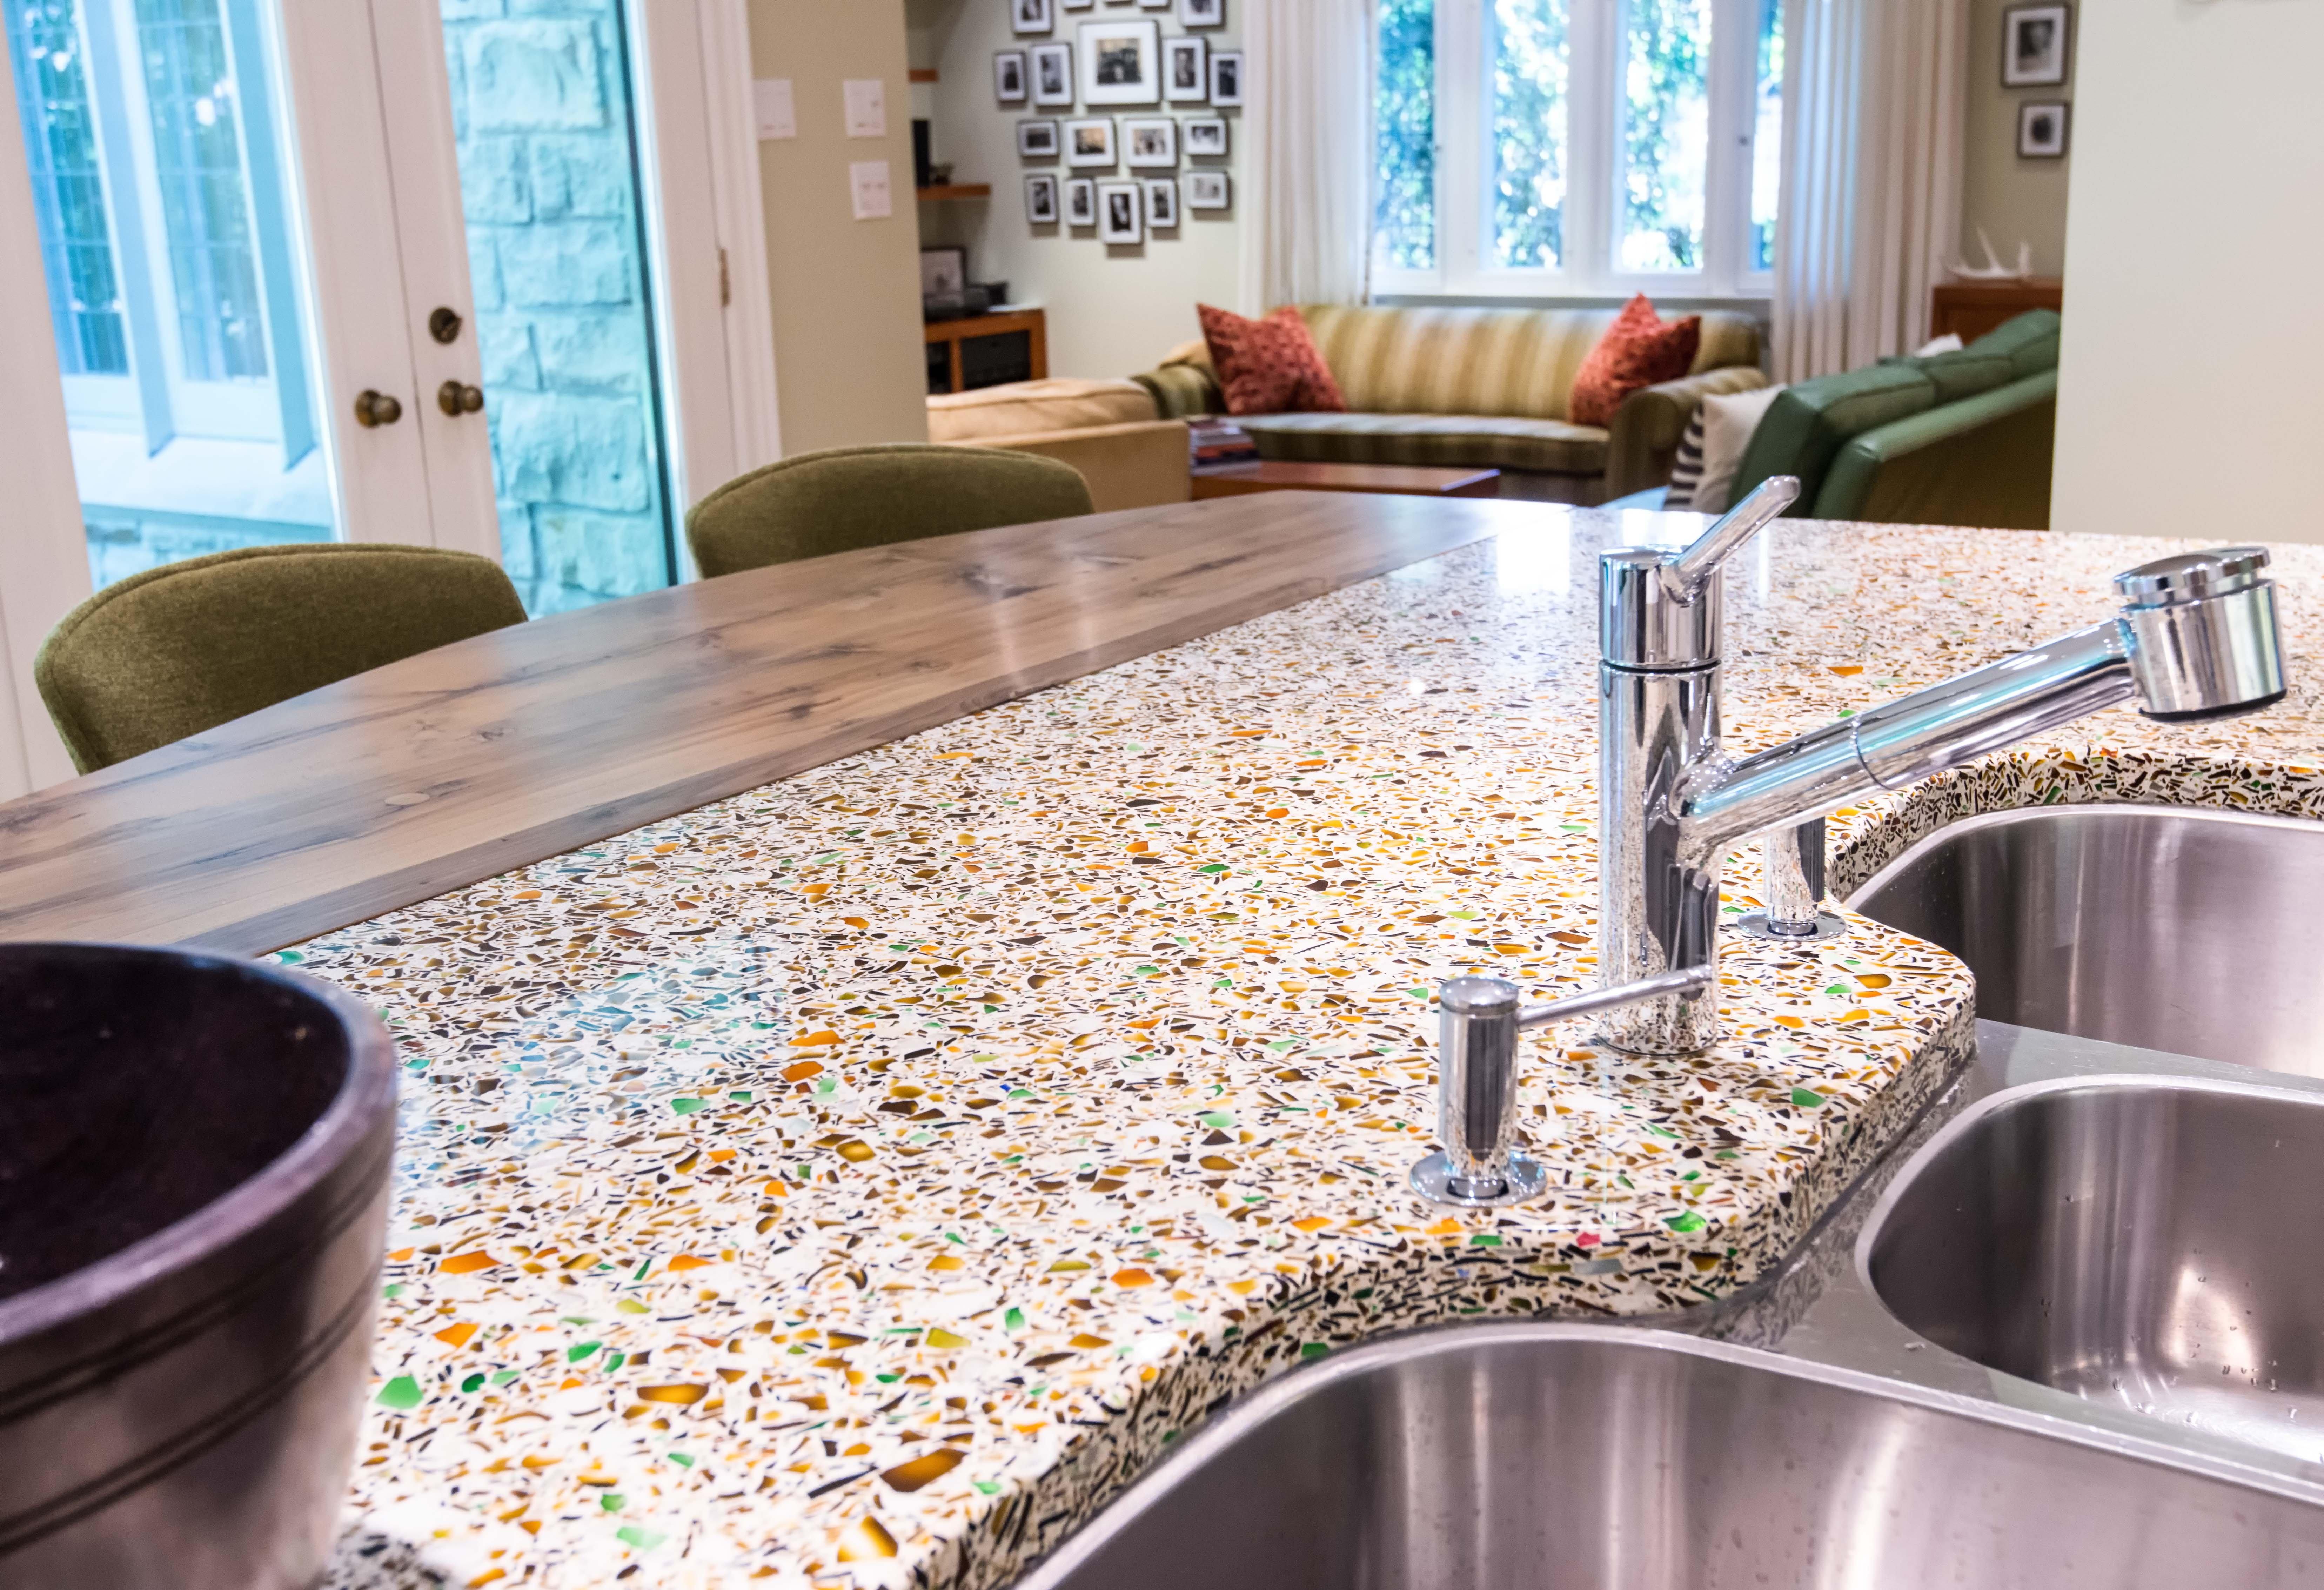 Catherine-friis-toronto-design-vetrazzo-recycled-glass-countertops-alehouse-amber